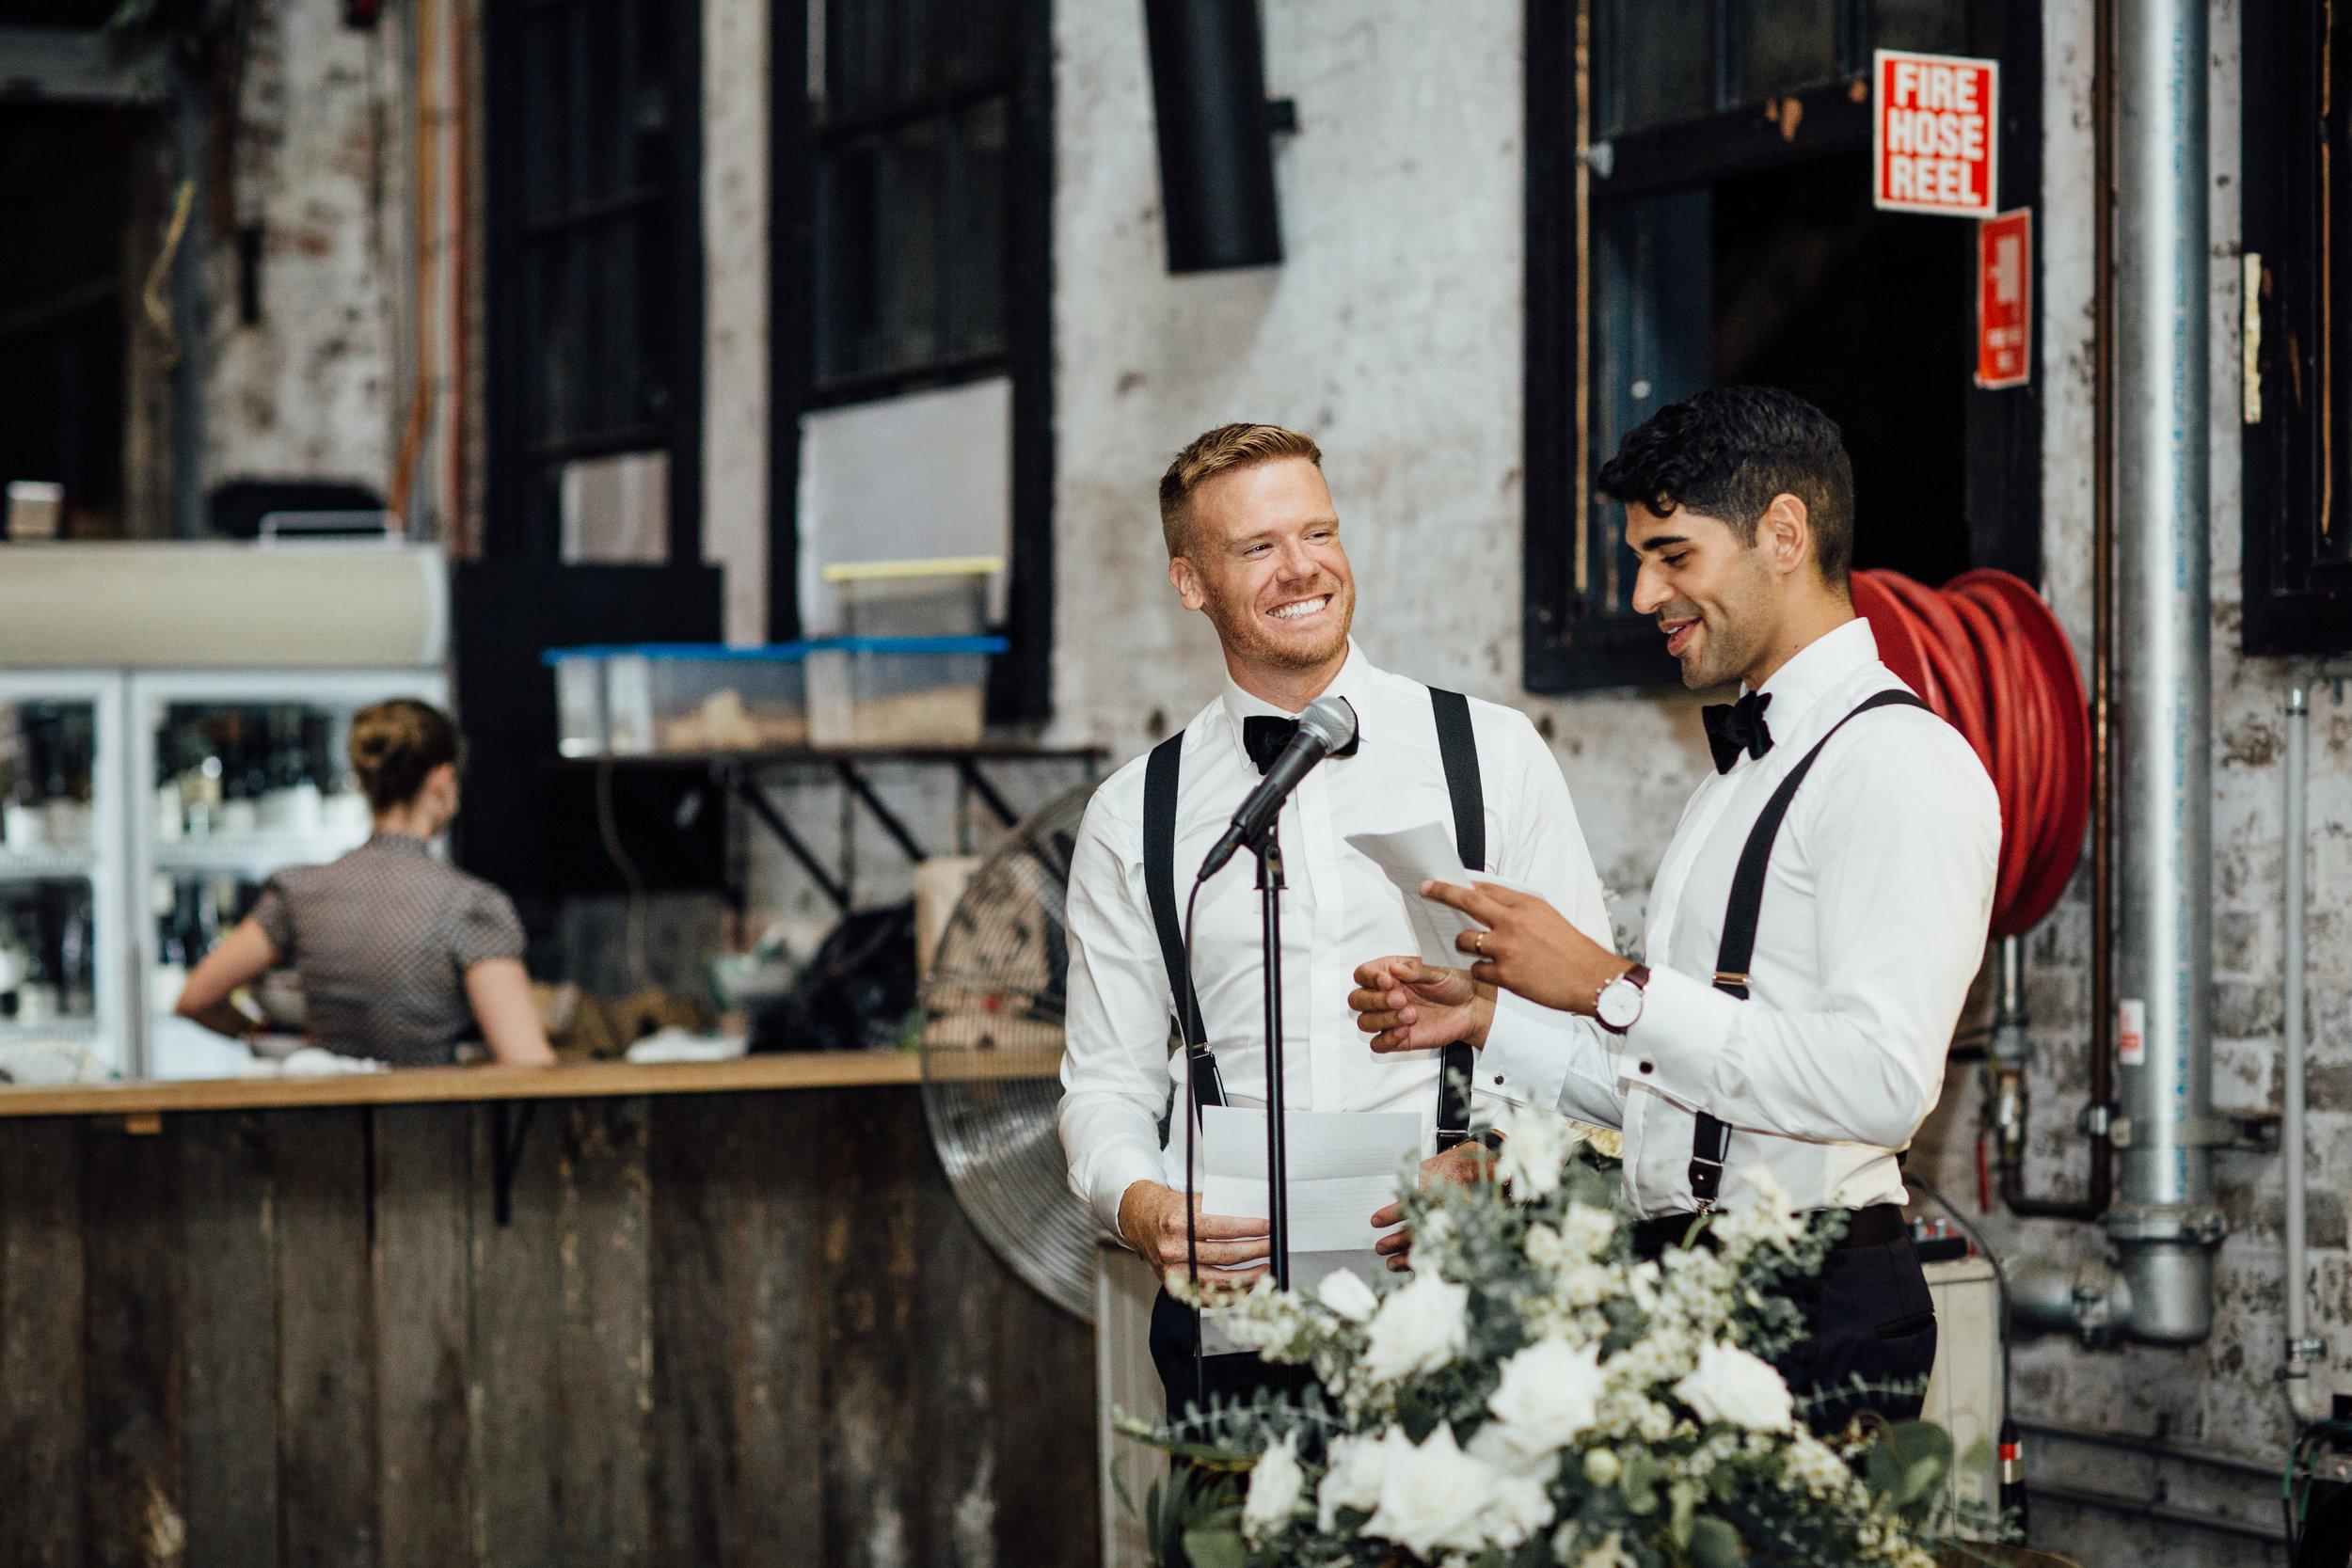 Stephen&David-Wedding-822.jpg